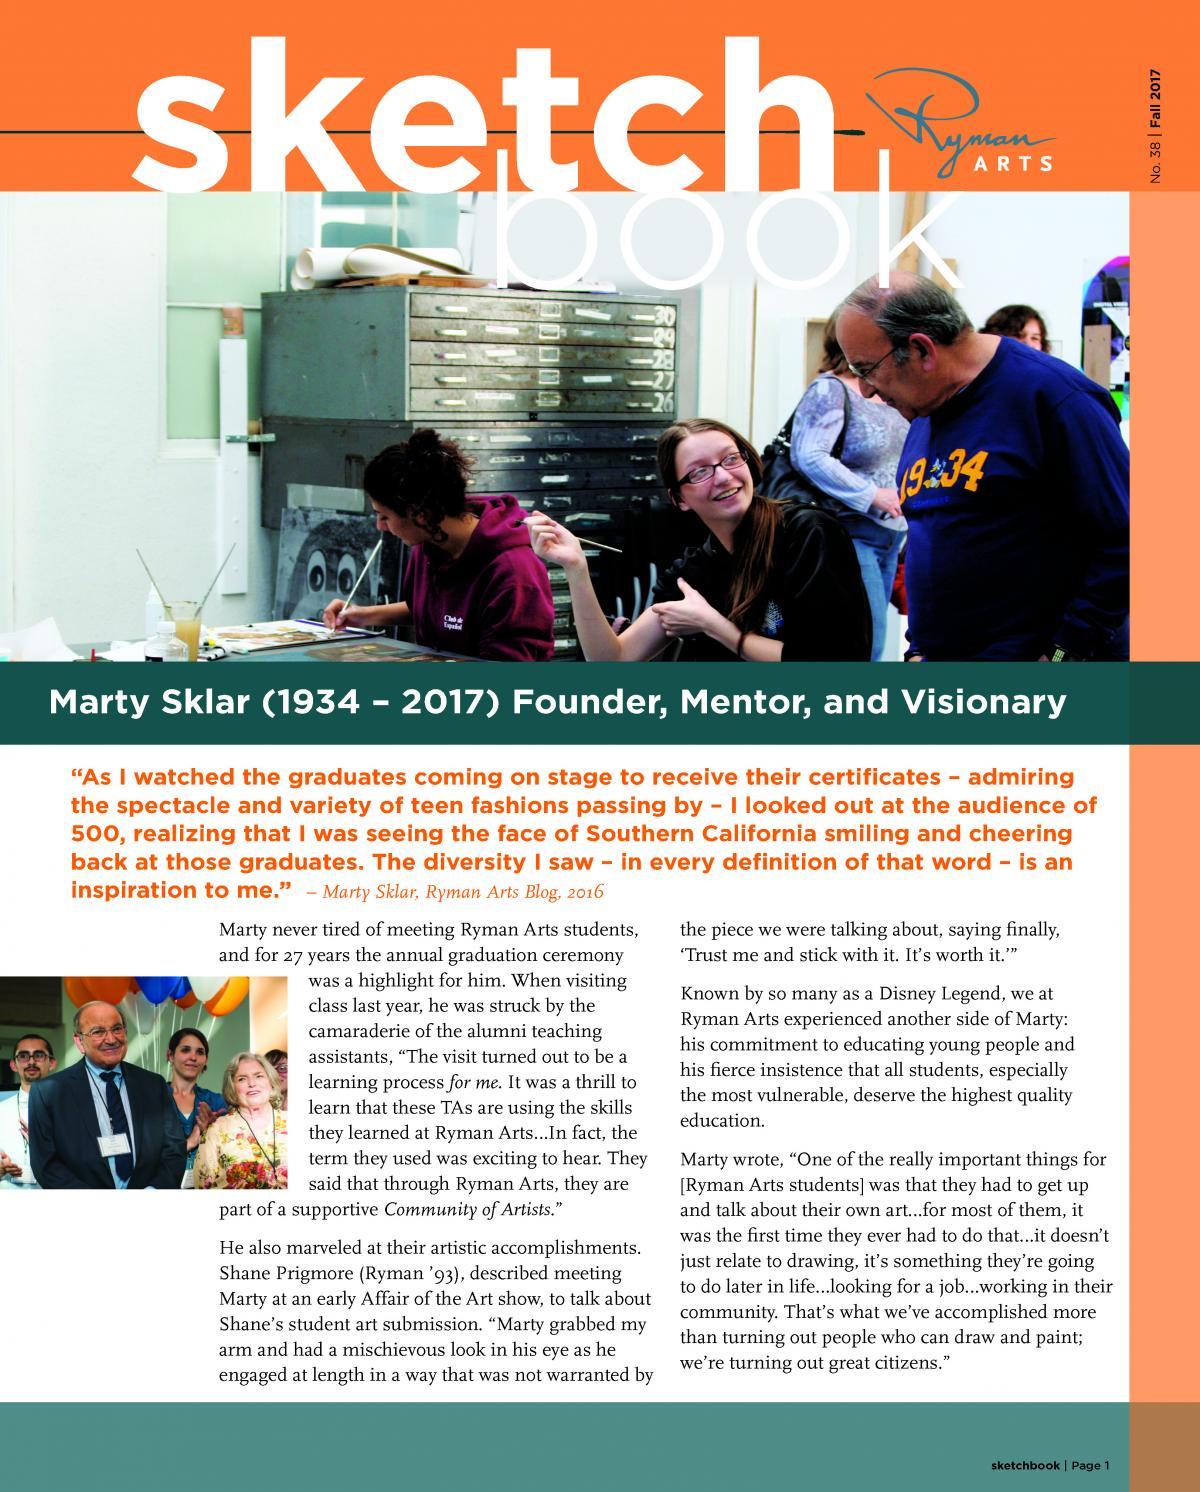 Ryman Arts Sketchbook Number 38, Fall 2017: Marty Sklar (1934-2017) Founder, Mentor, and Visionary